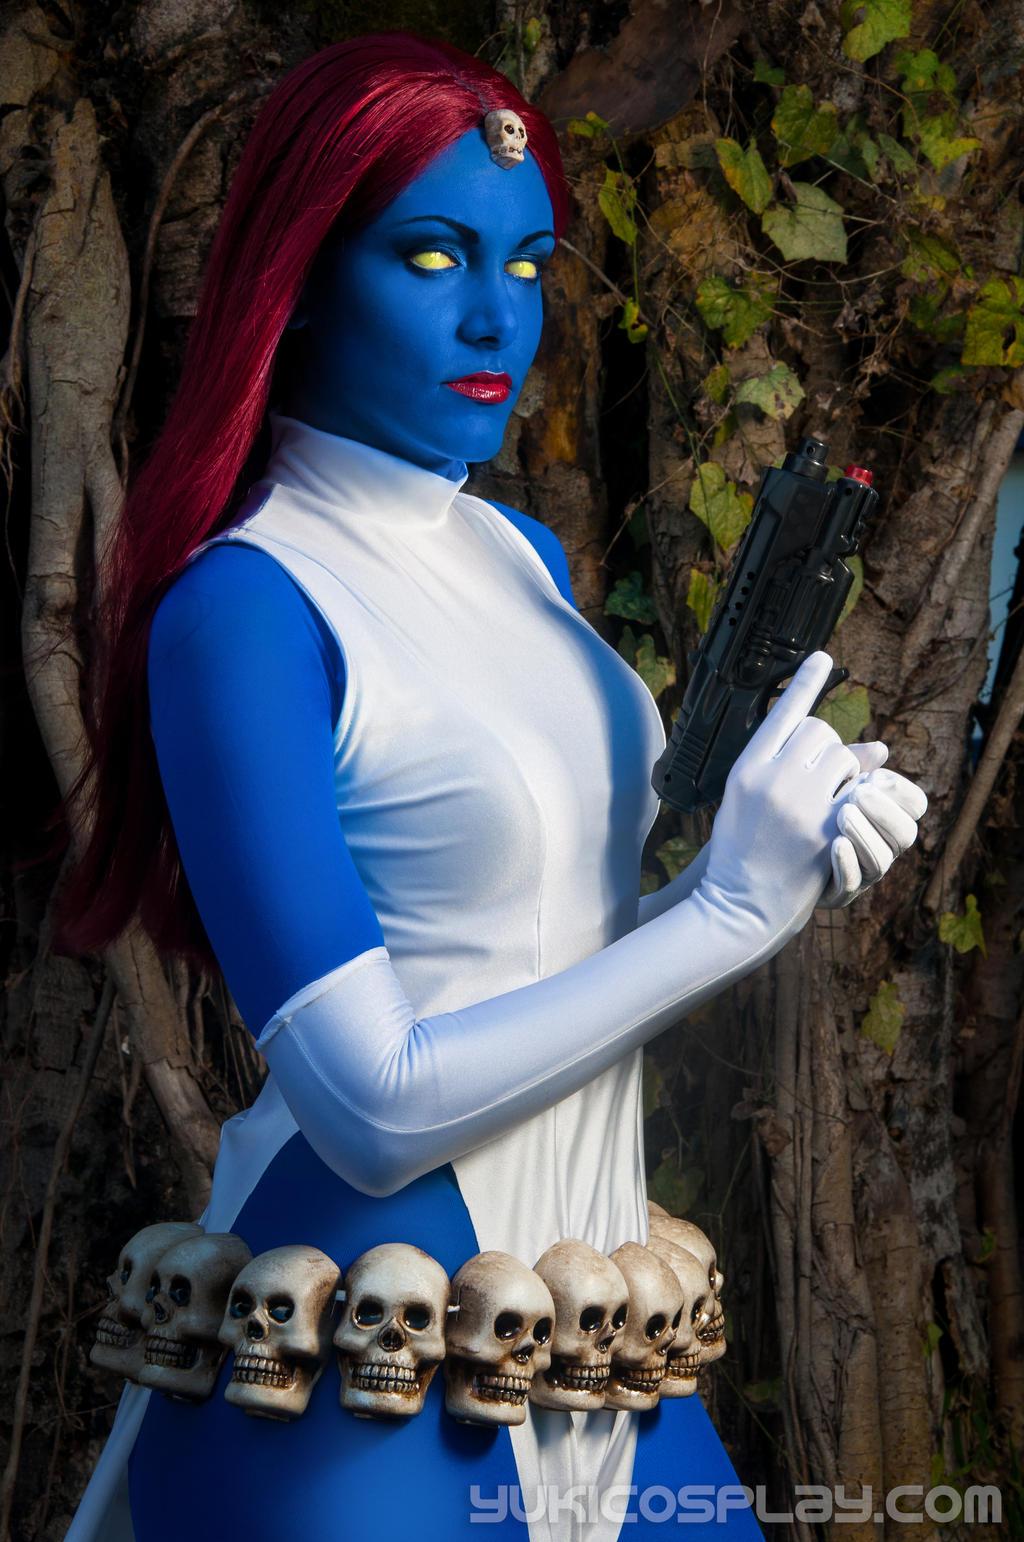 X-men -  Mystique cosplay by Yukilefay